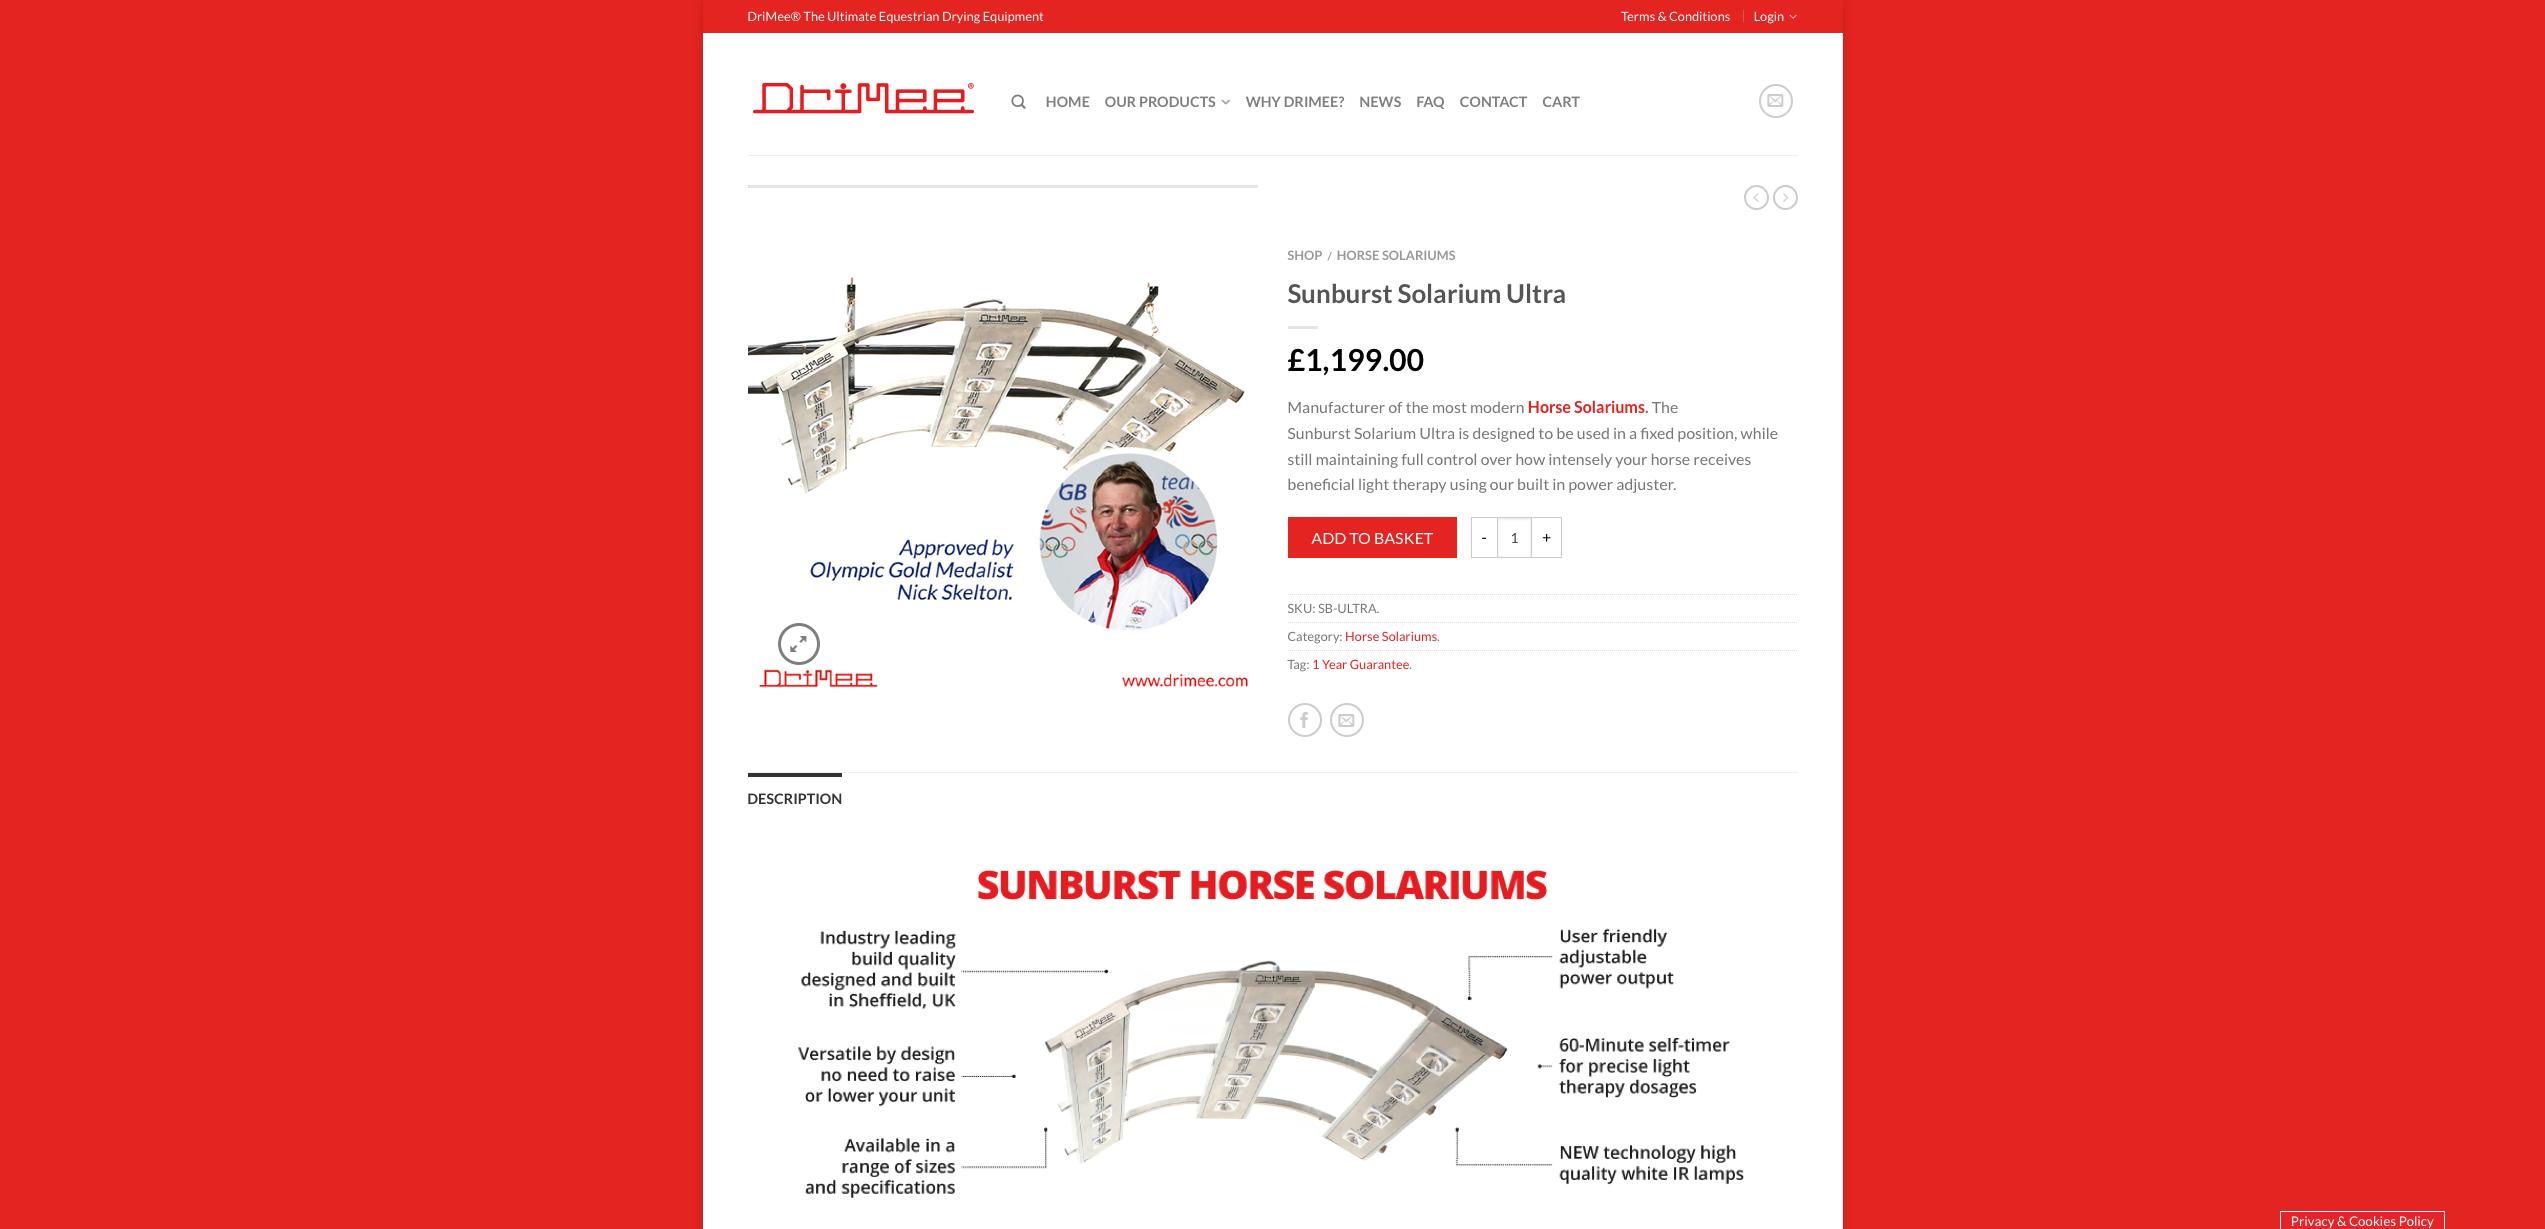 IDEA UK Design and Marketing Drimee Equestrian Horse Equipment Website Design 6